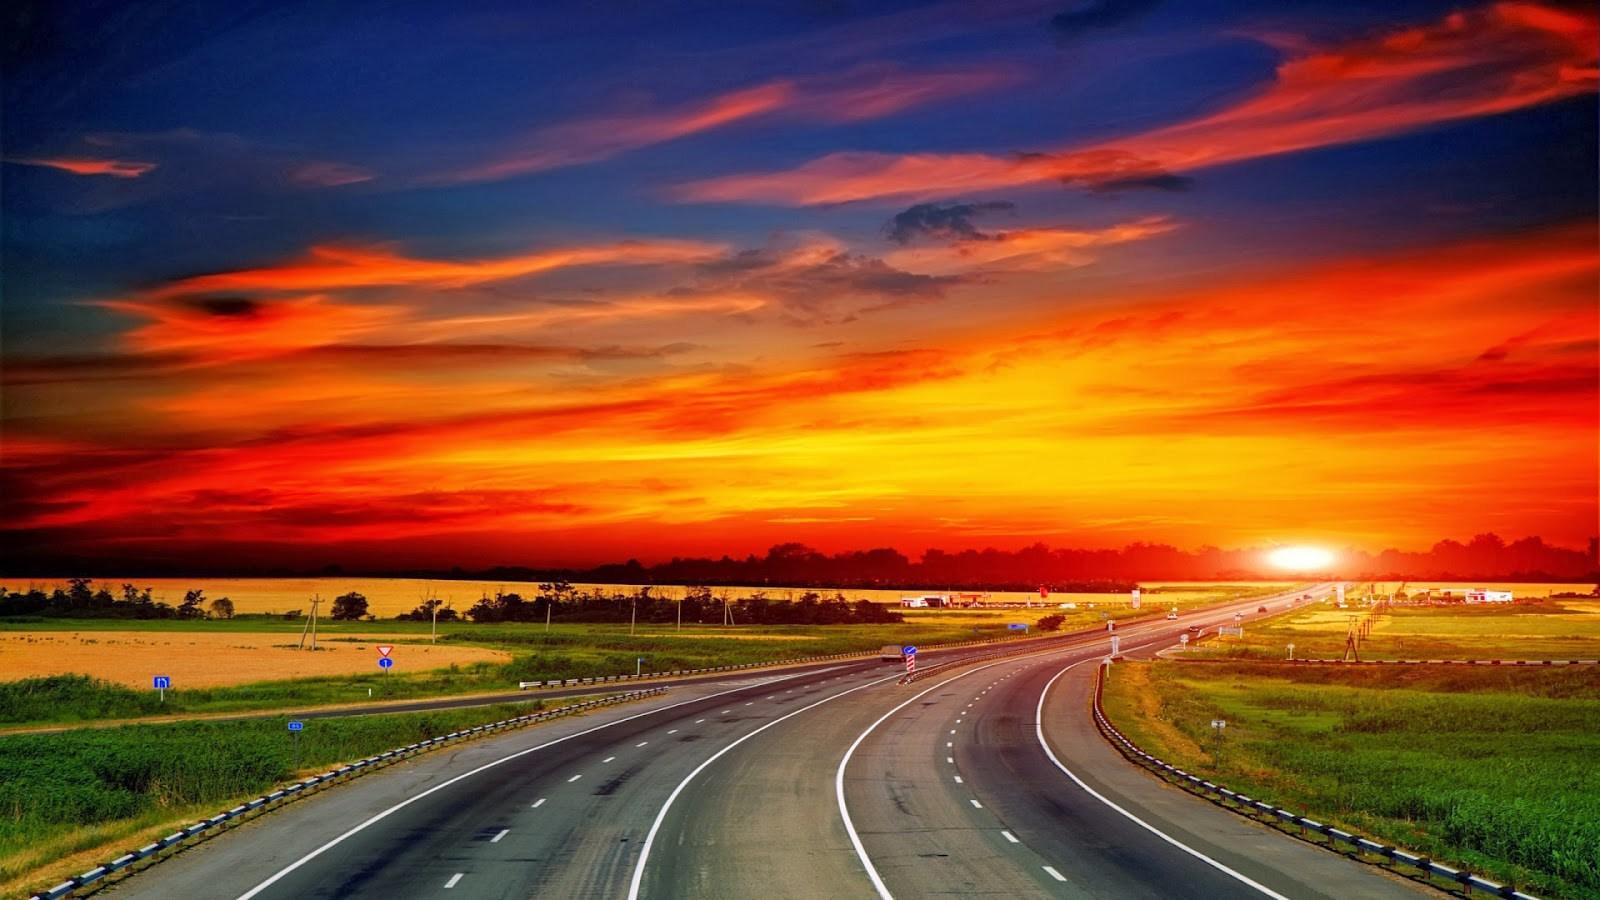 Chris Rea Two Roads HD Wallpaper & Backgrounds